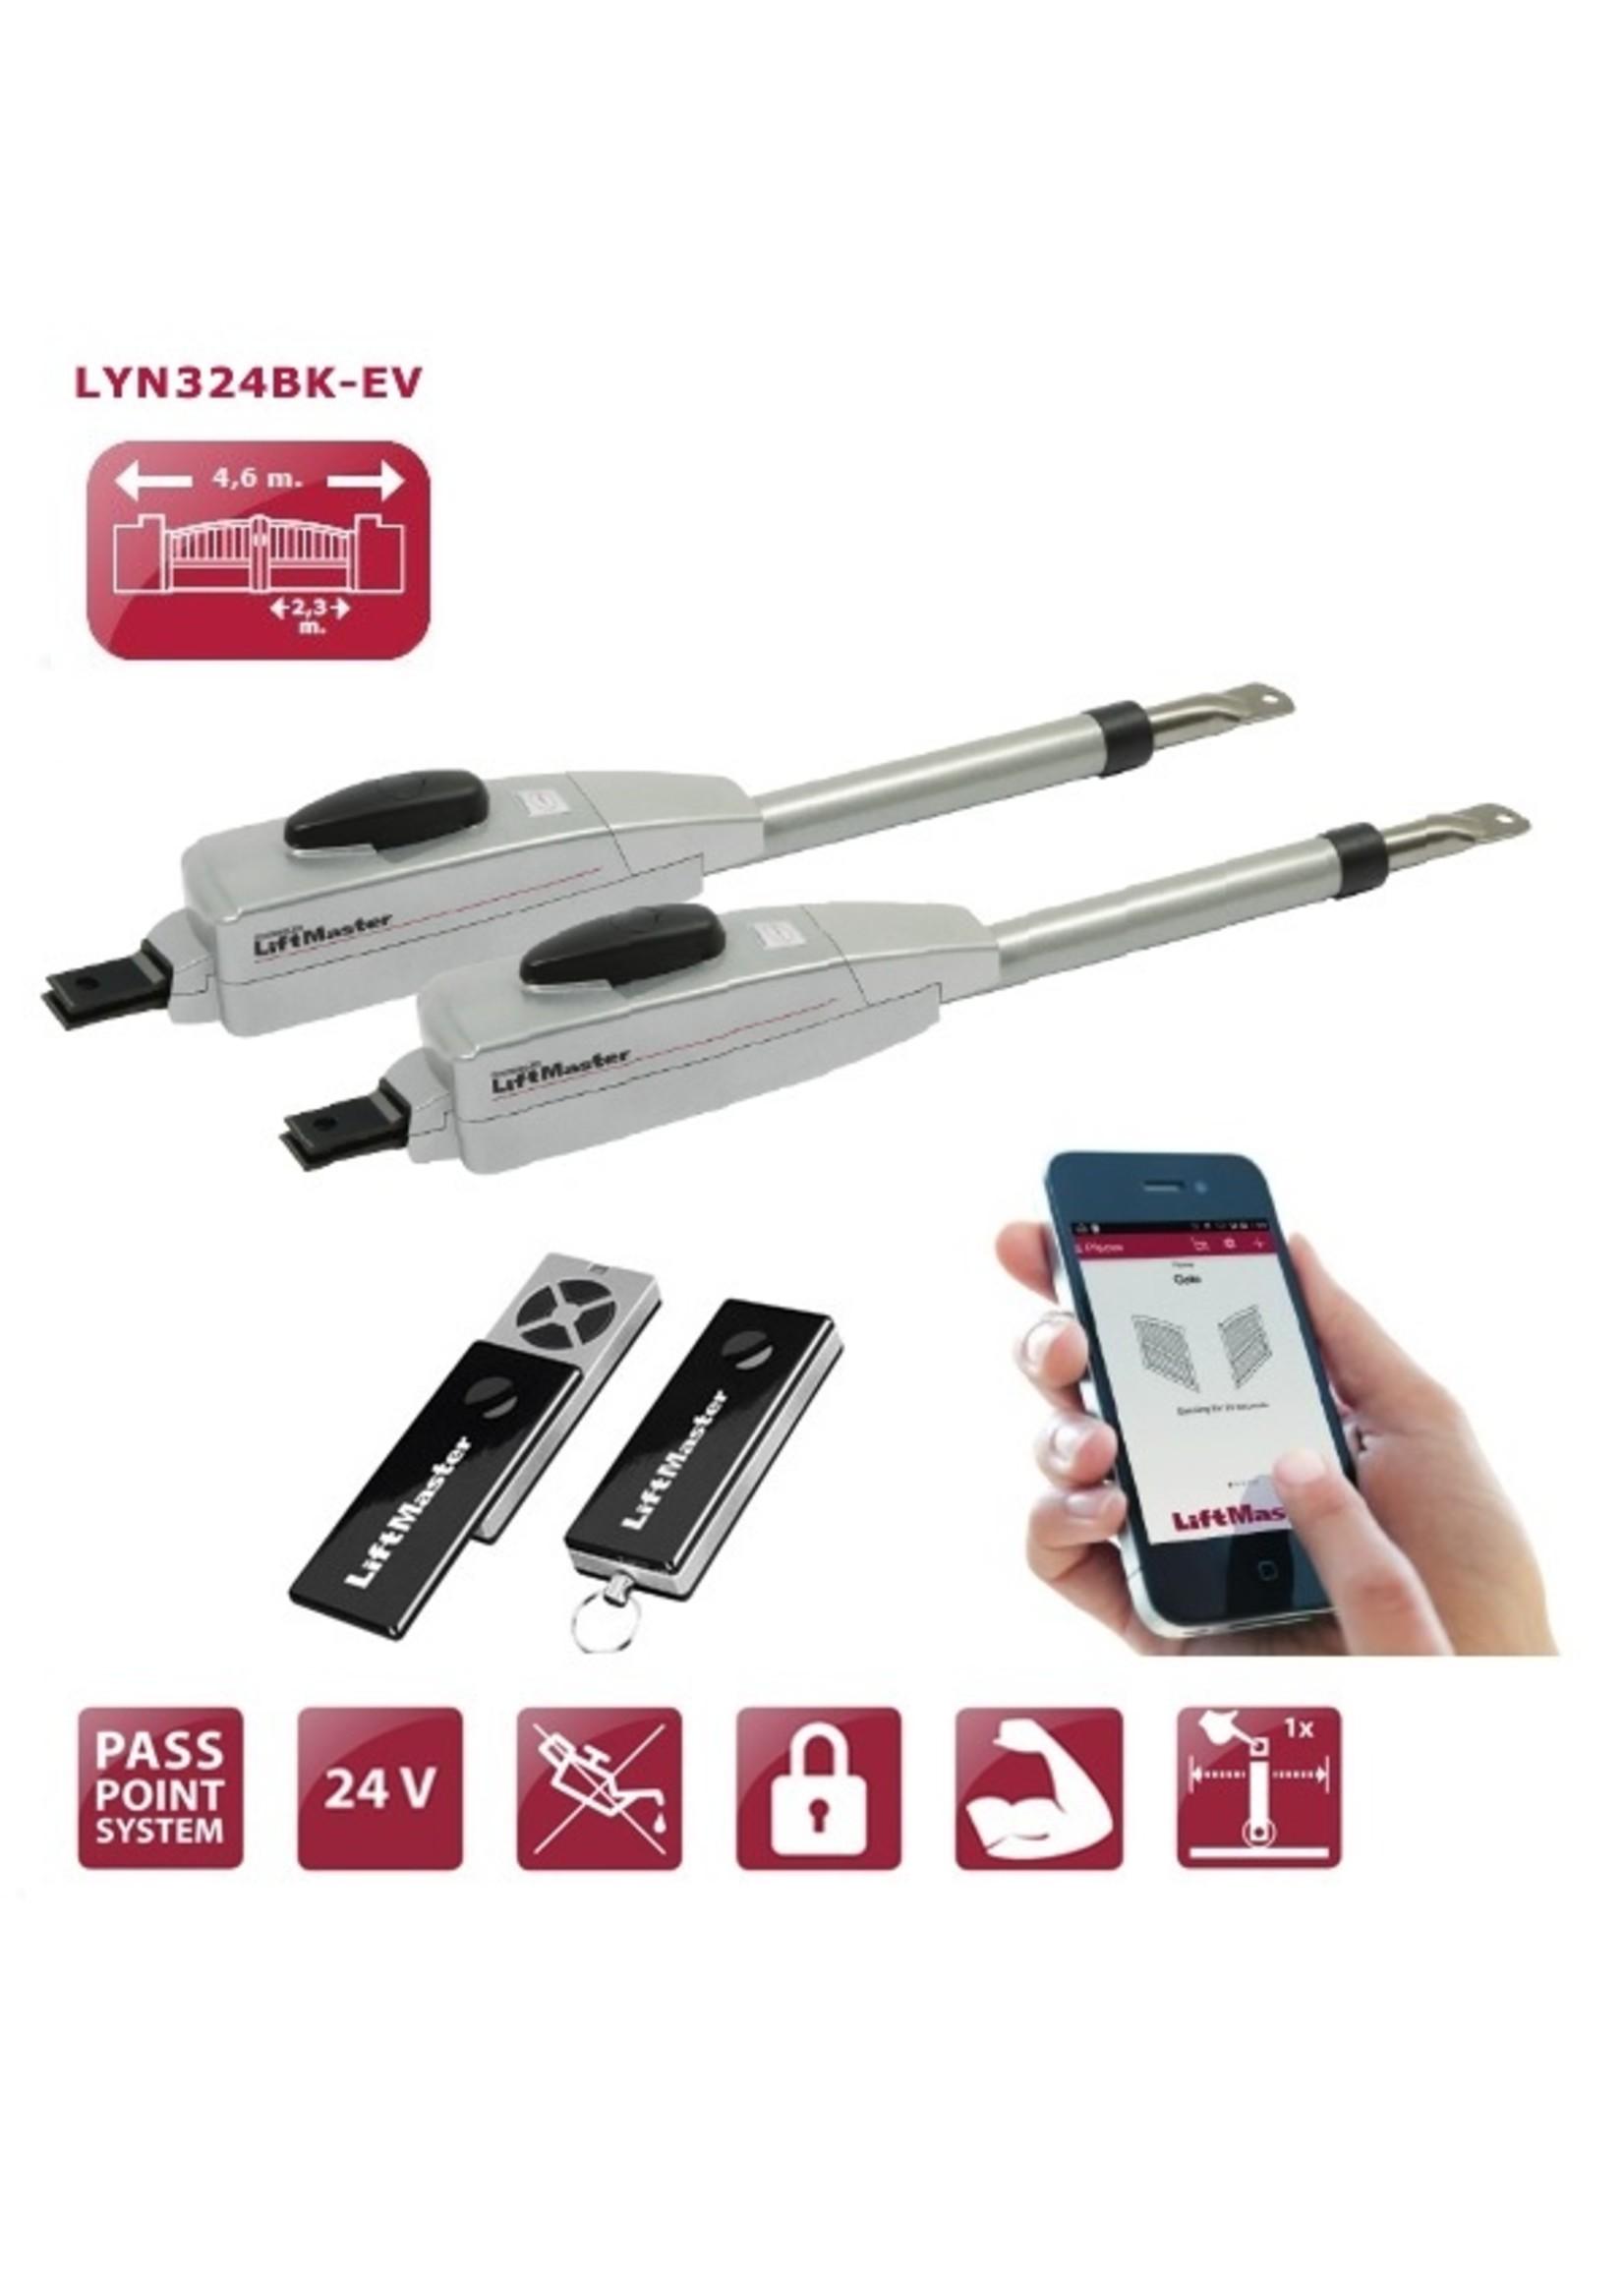 Liftmaster LYN324BK-EV 24V automatisme portail à battants LYN300-24